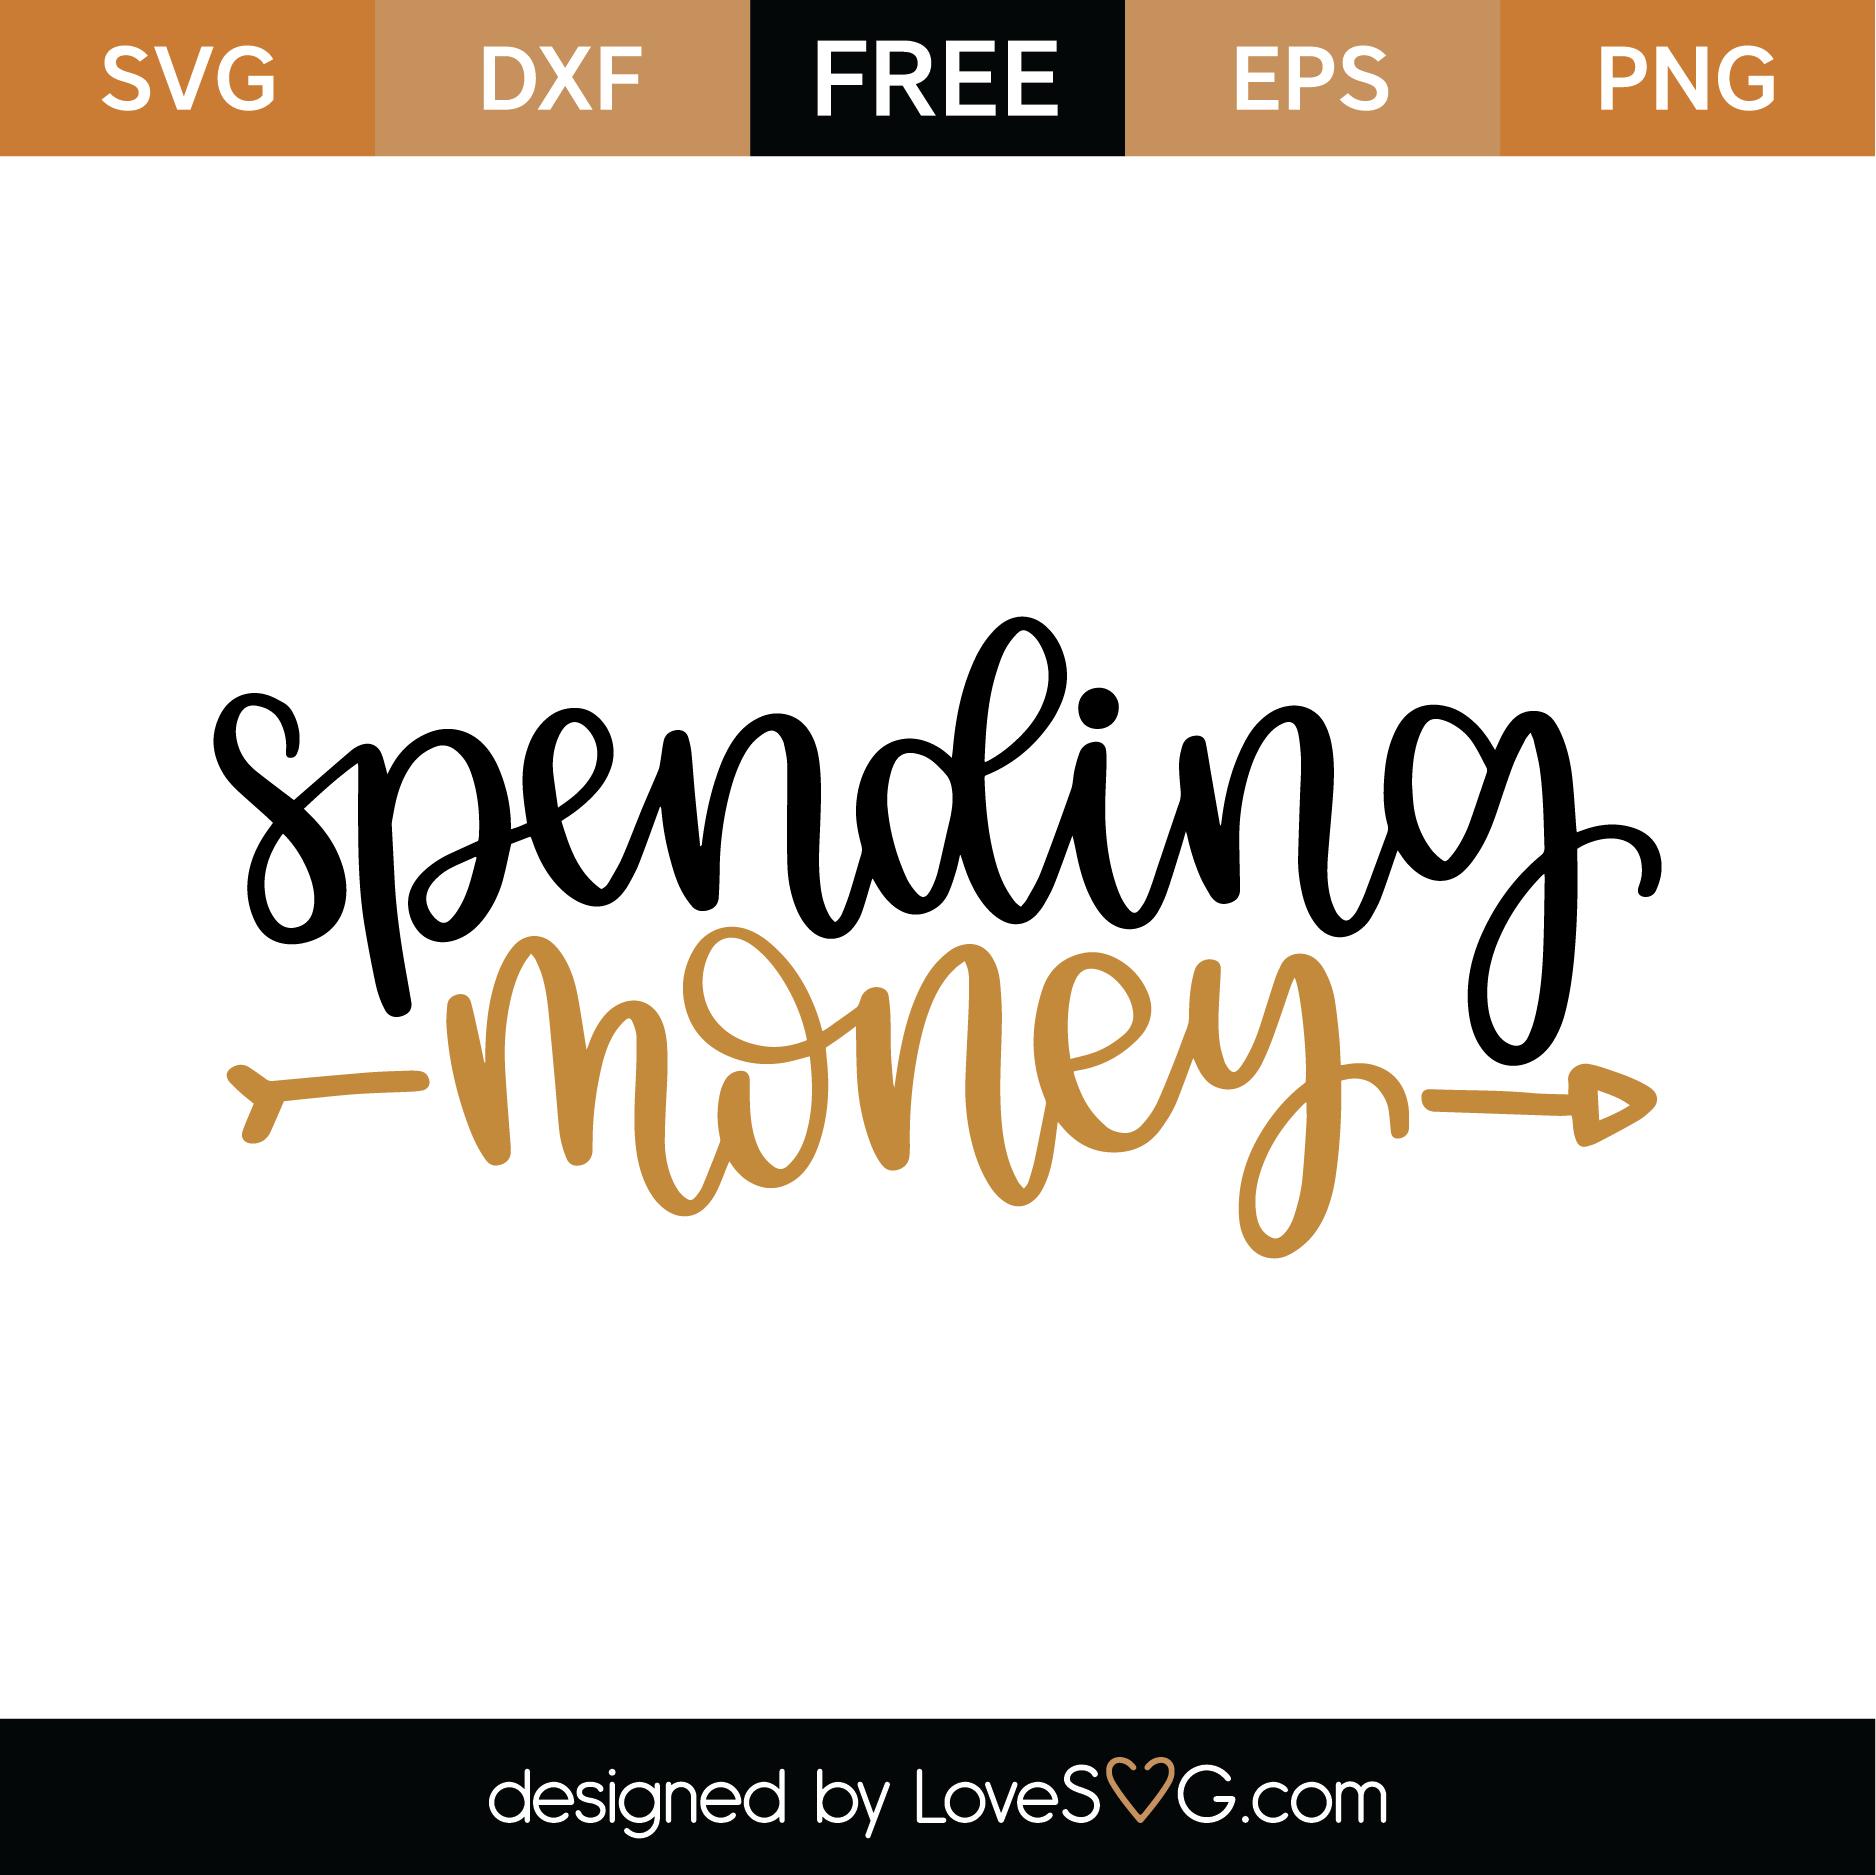 Download Free Spending Money SVG Cut File   Lovesvg.com